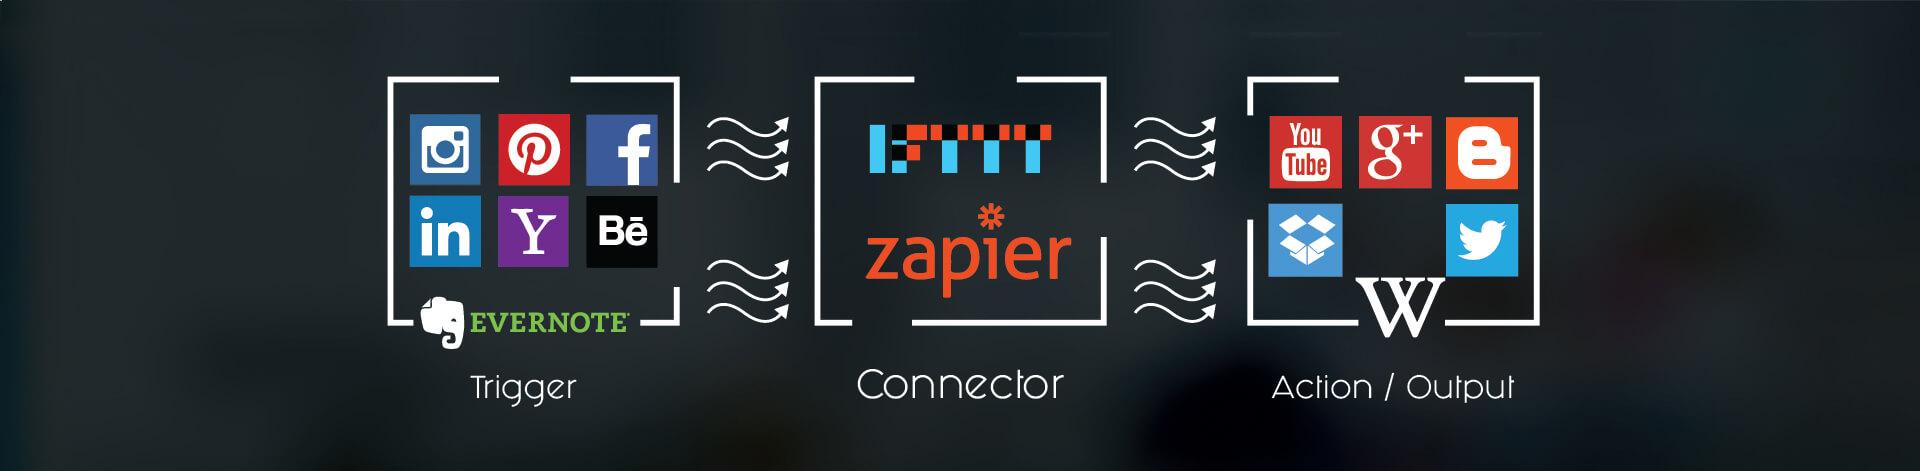 IFTTT Zapier, next level of Automation